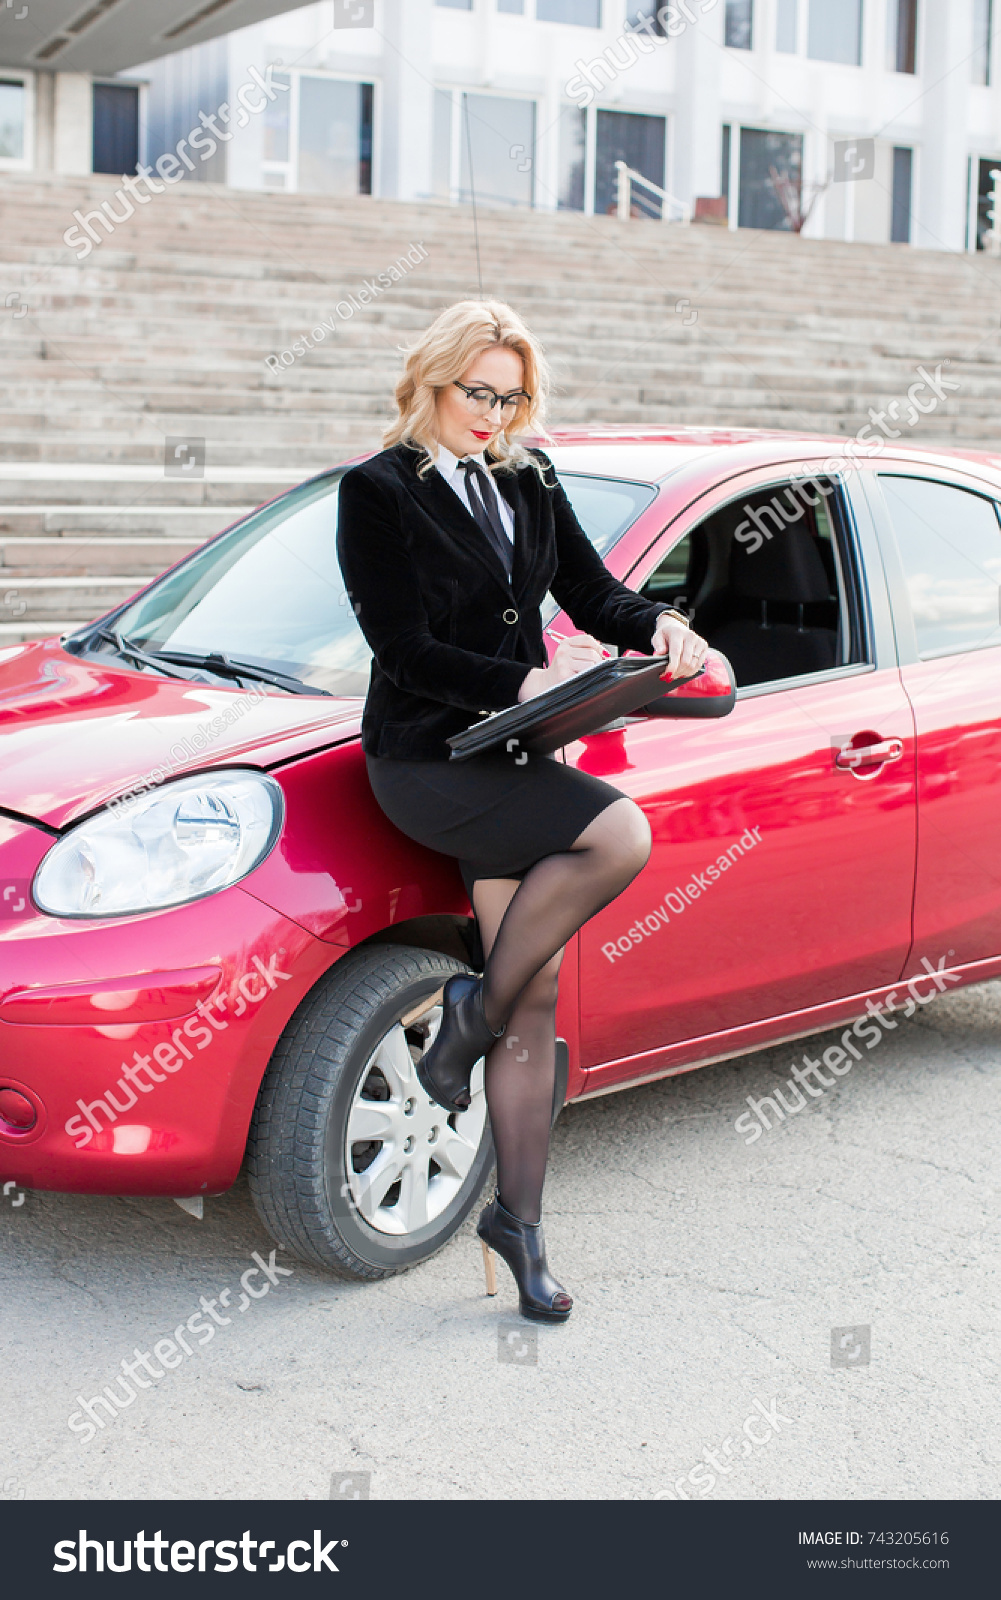 Auto Insurance Agent Stock Photo 743205616 - Shutterstock